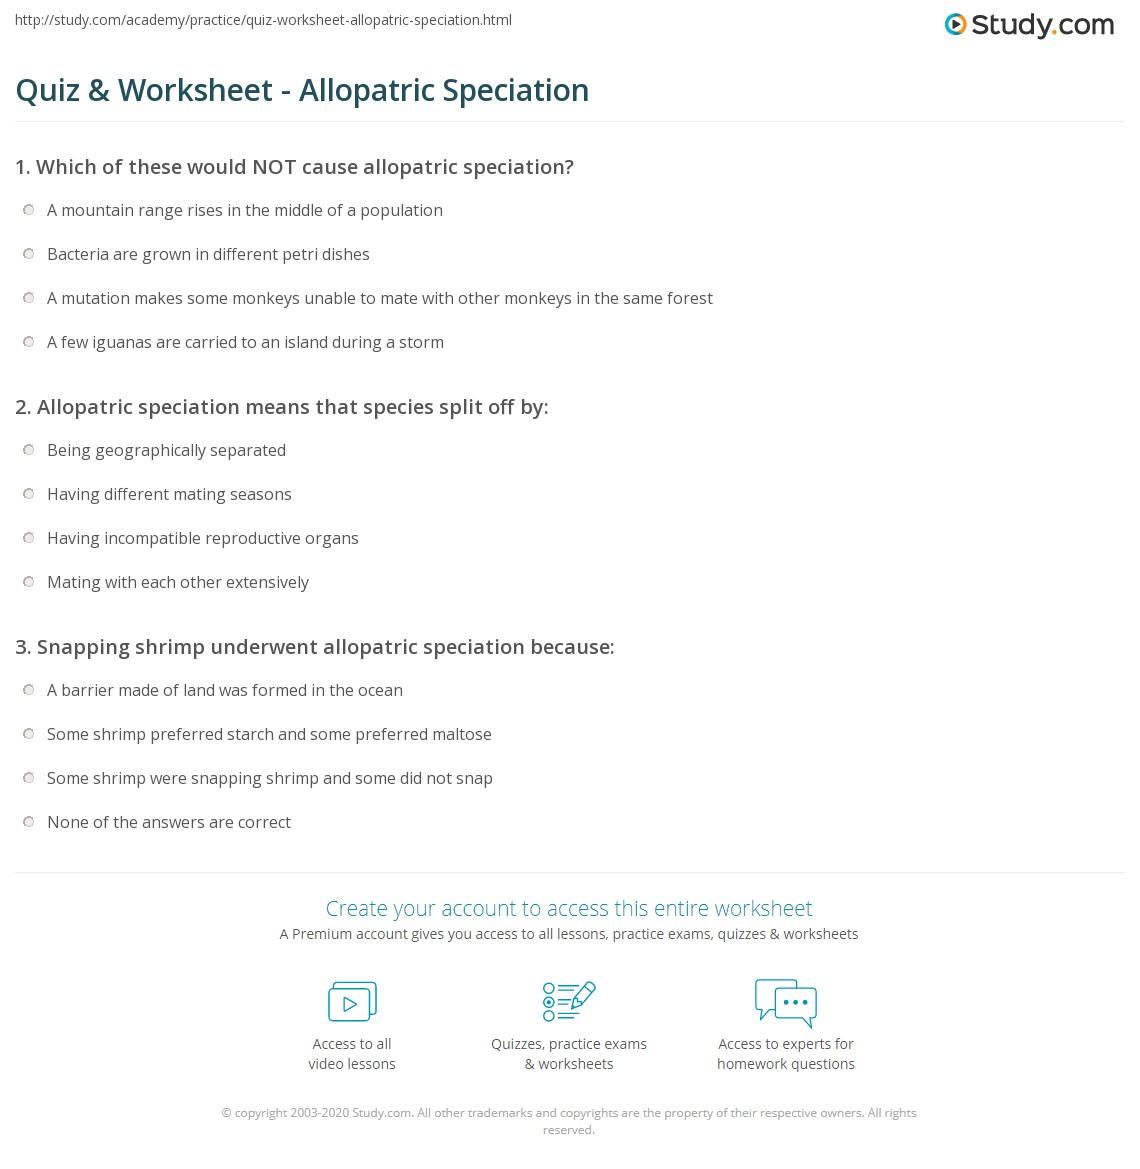 Quiz & Worksheet - Allopatric Speciation | Study.com